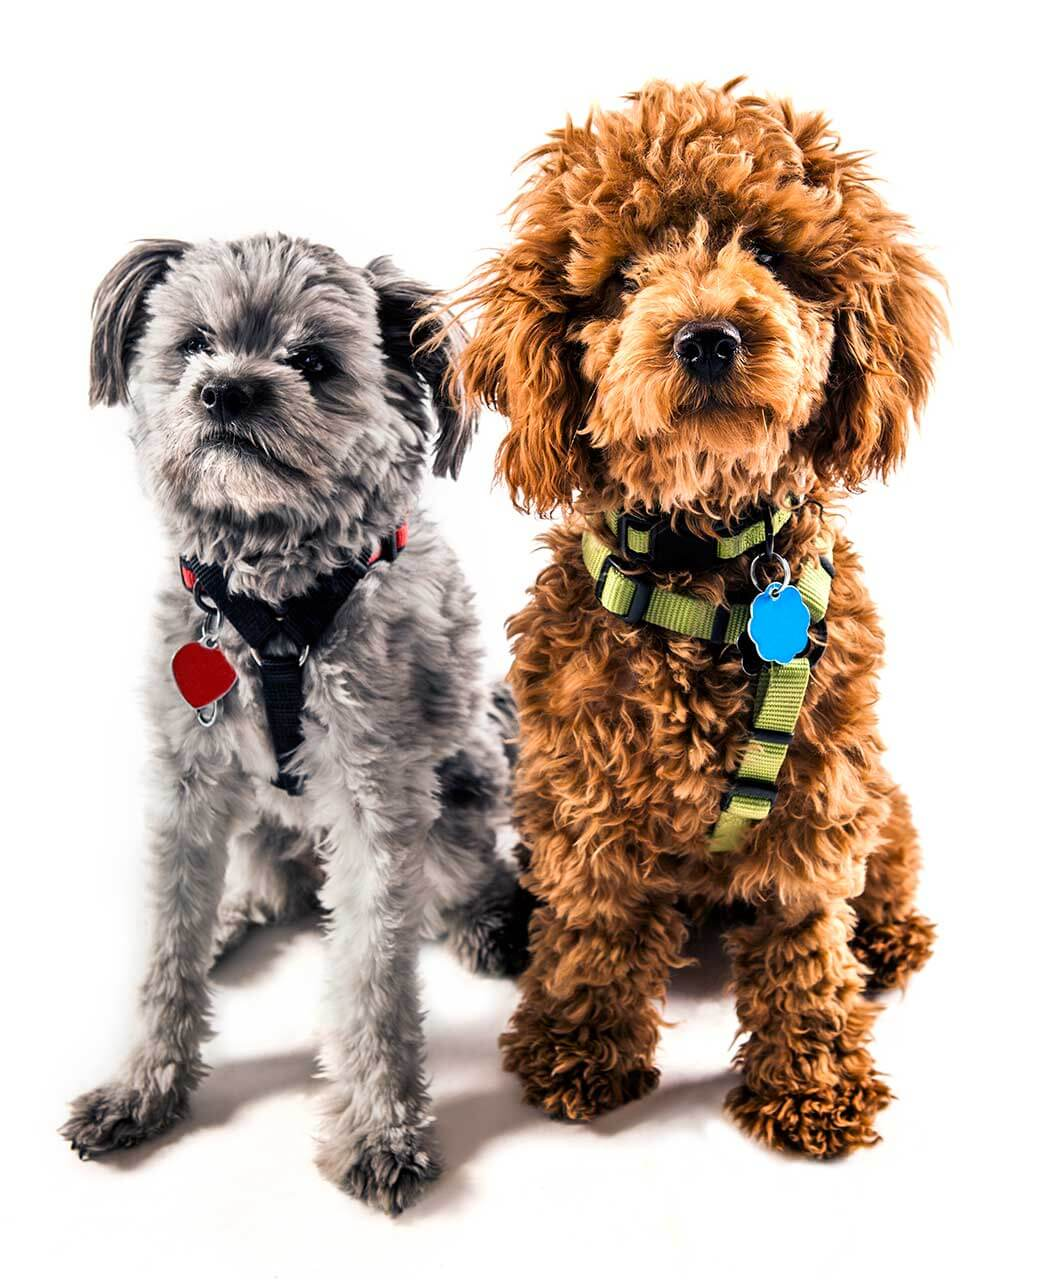 Yorkiepoo Dog Breed » Everything About Yorkiepoo